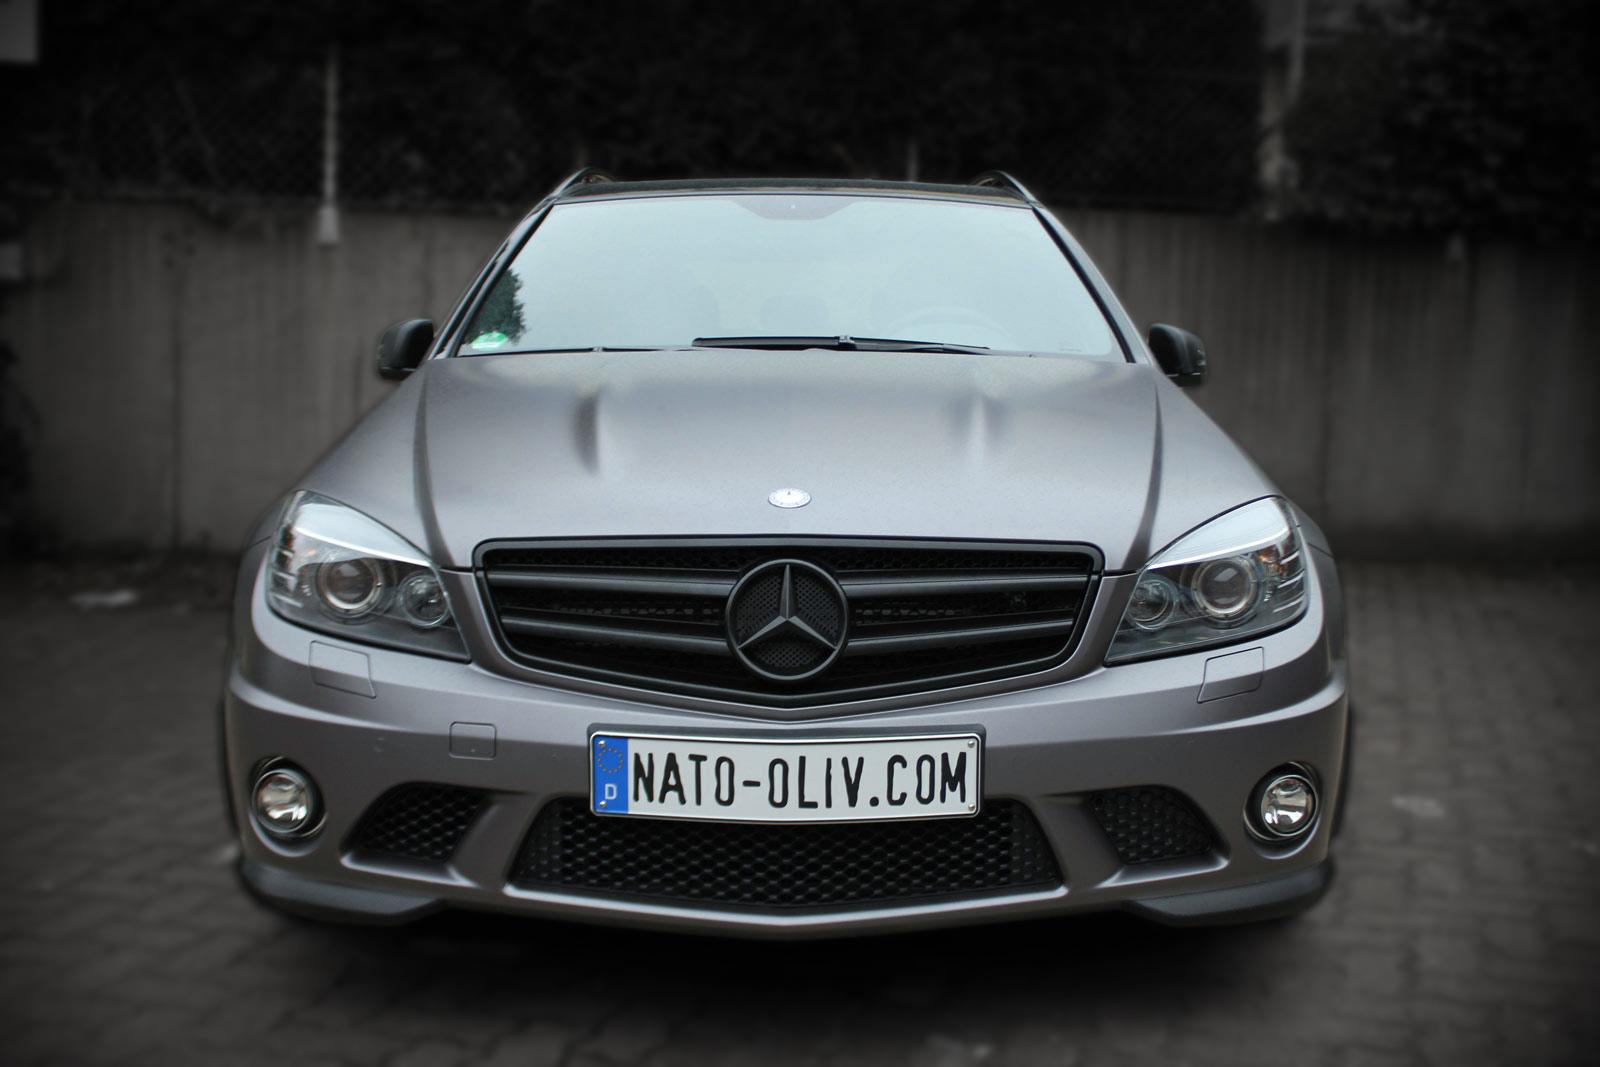 Mercedes_C63_AMG_Folierung_Anthrazit_Matt_Metallic_Titelbild